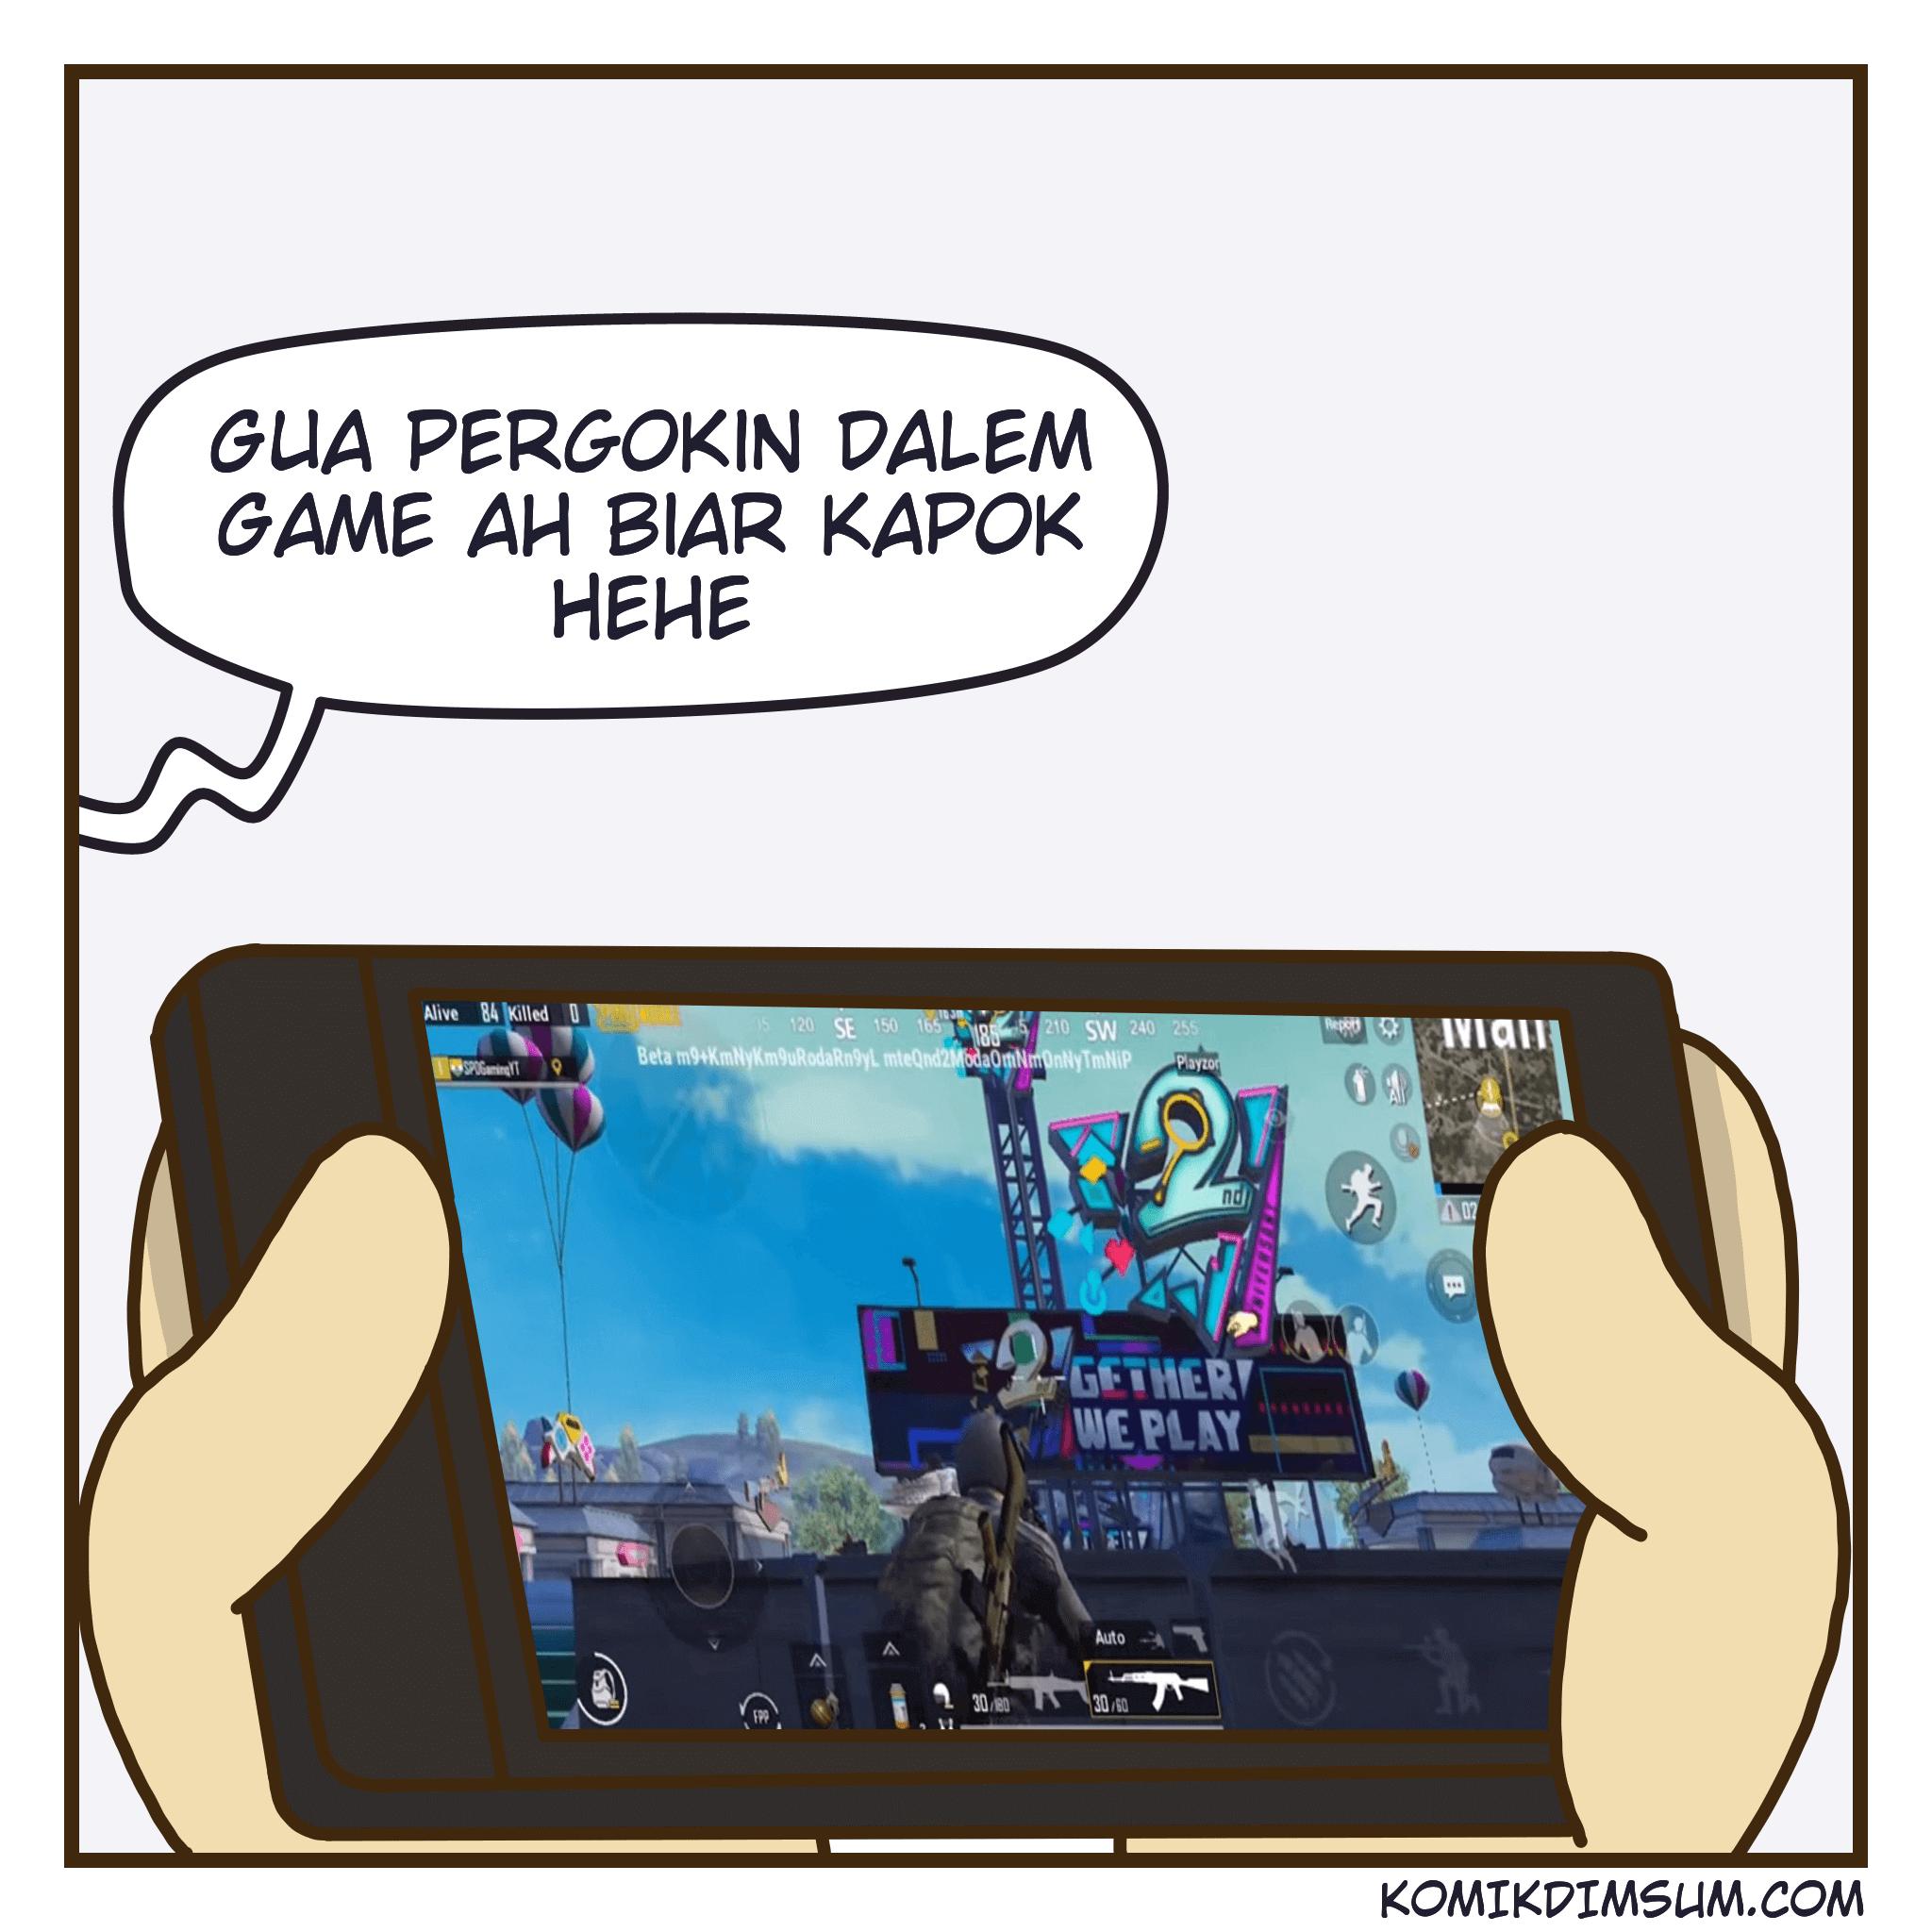 Royale Pass Season 12 – Komik Dimsum x PUBG Mobile